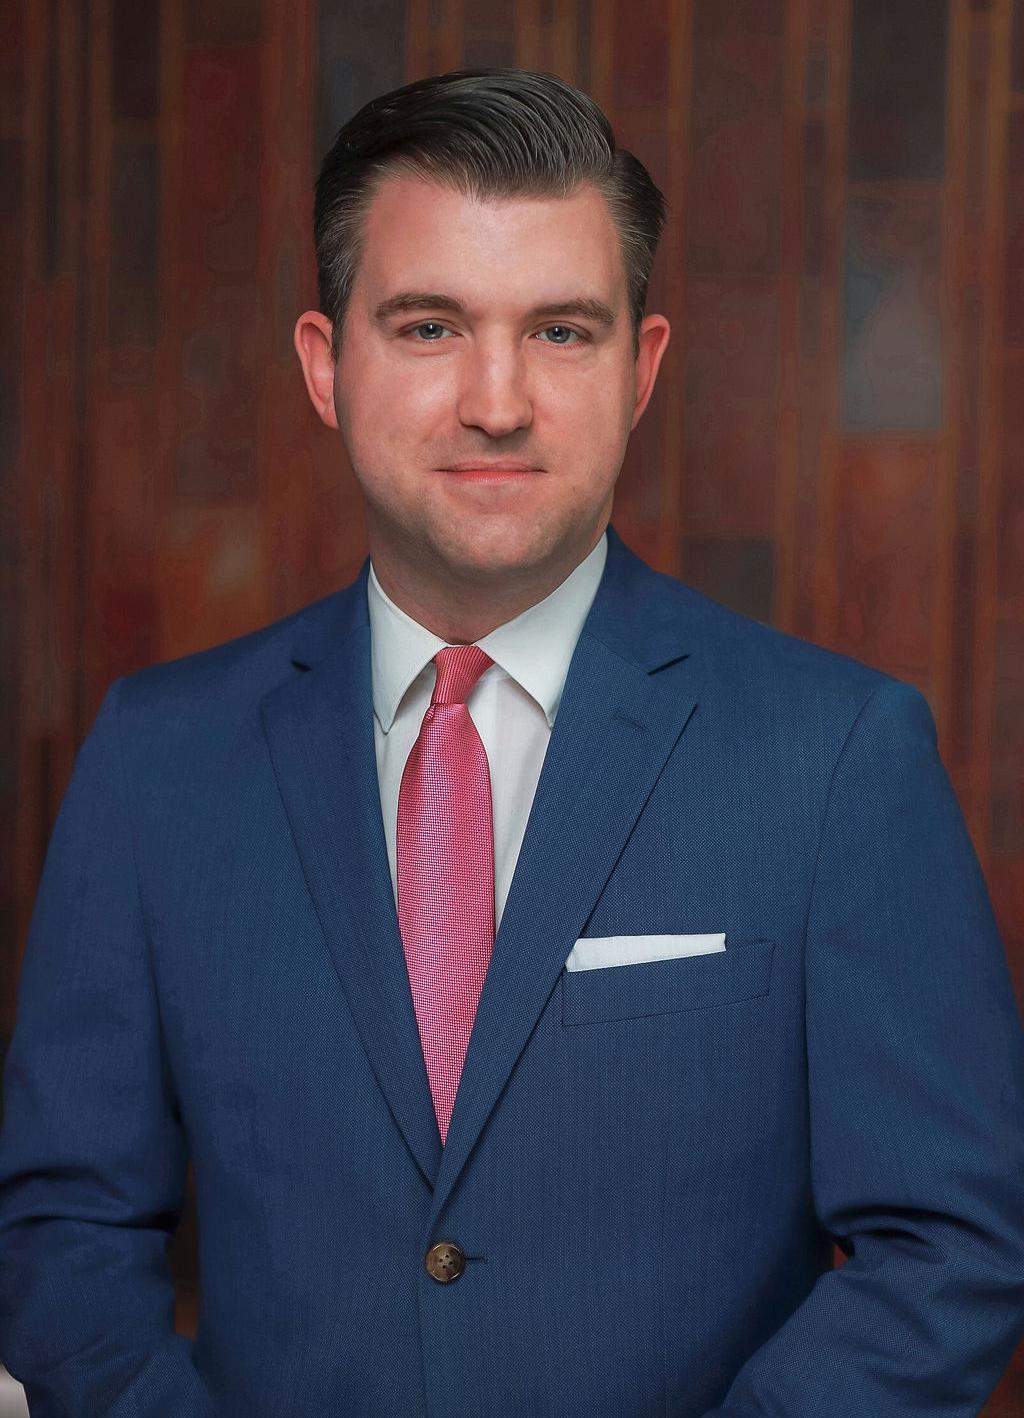 Josh Gauntt, WBRC